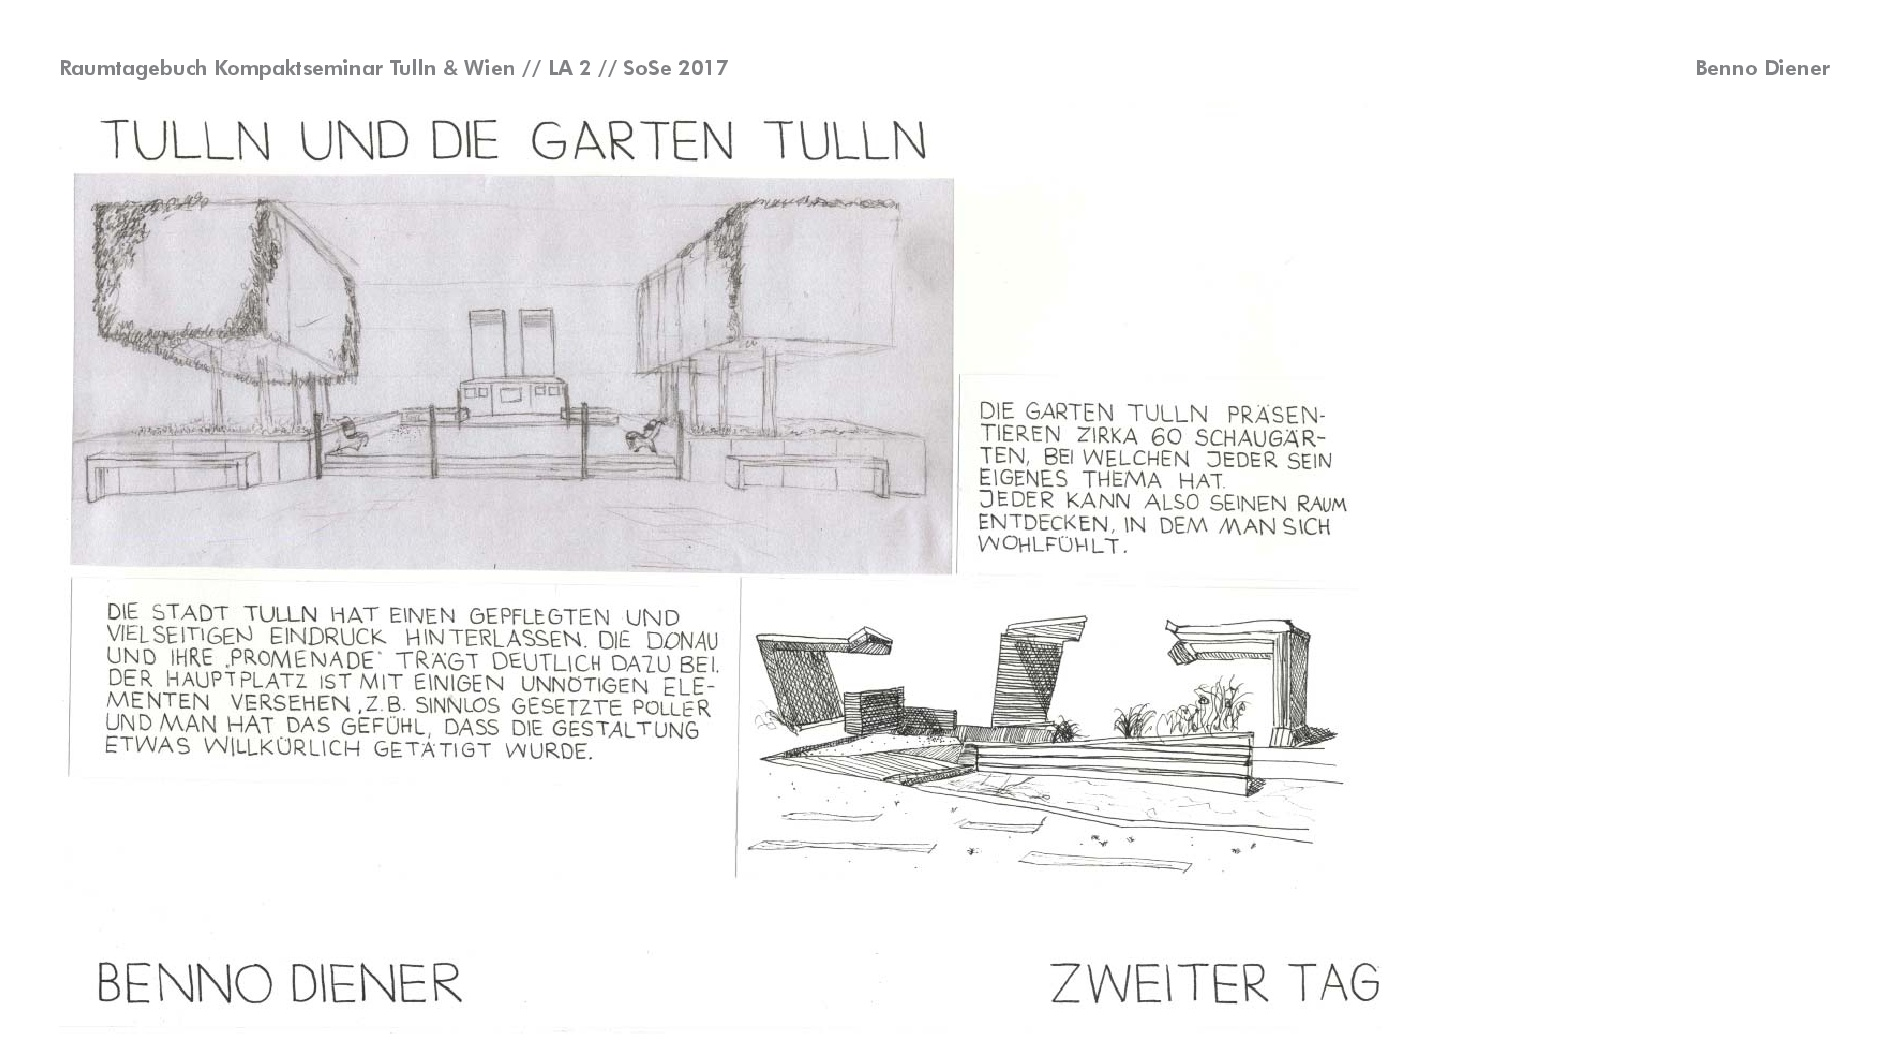 NEU Screen Raumtagebuch Tulln Wien SoSe 17 008